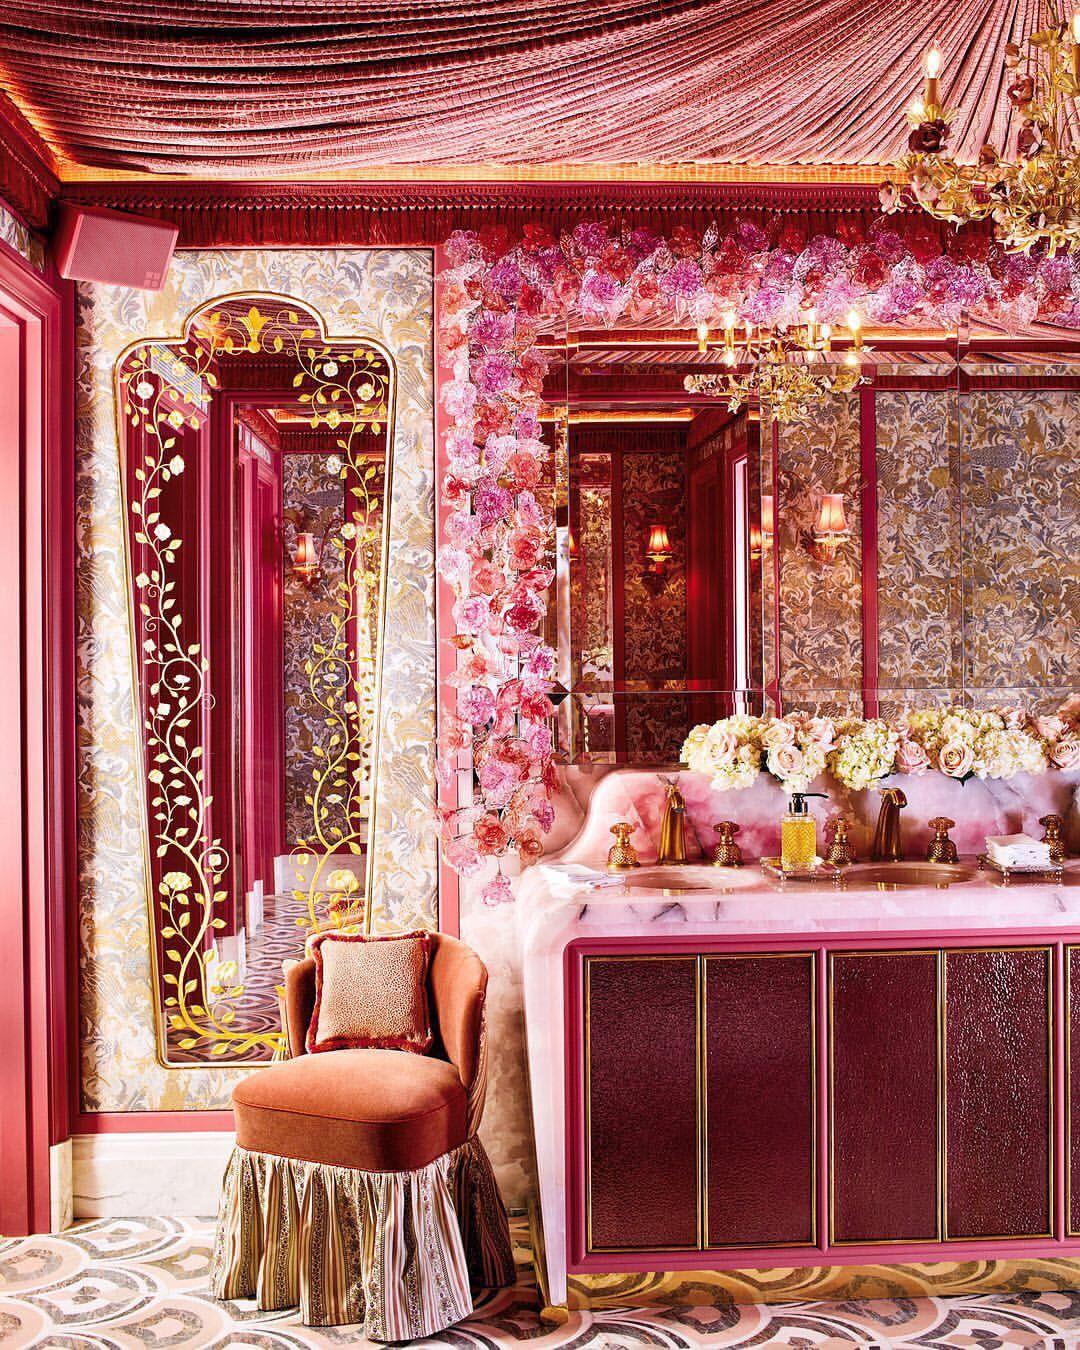 Elizabeth Taylor Meets Marie Antoinette In The Opulent Pink On Pink Ladies Powder Room At The Reinvented Anna Home Interior Design Best Interior Design Decor